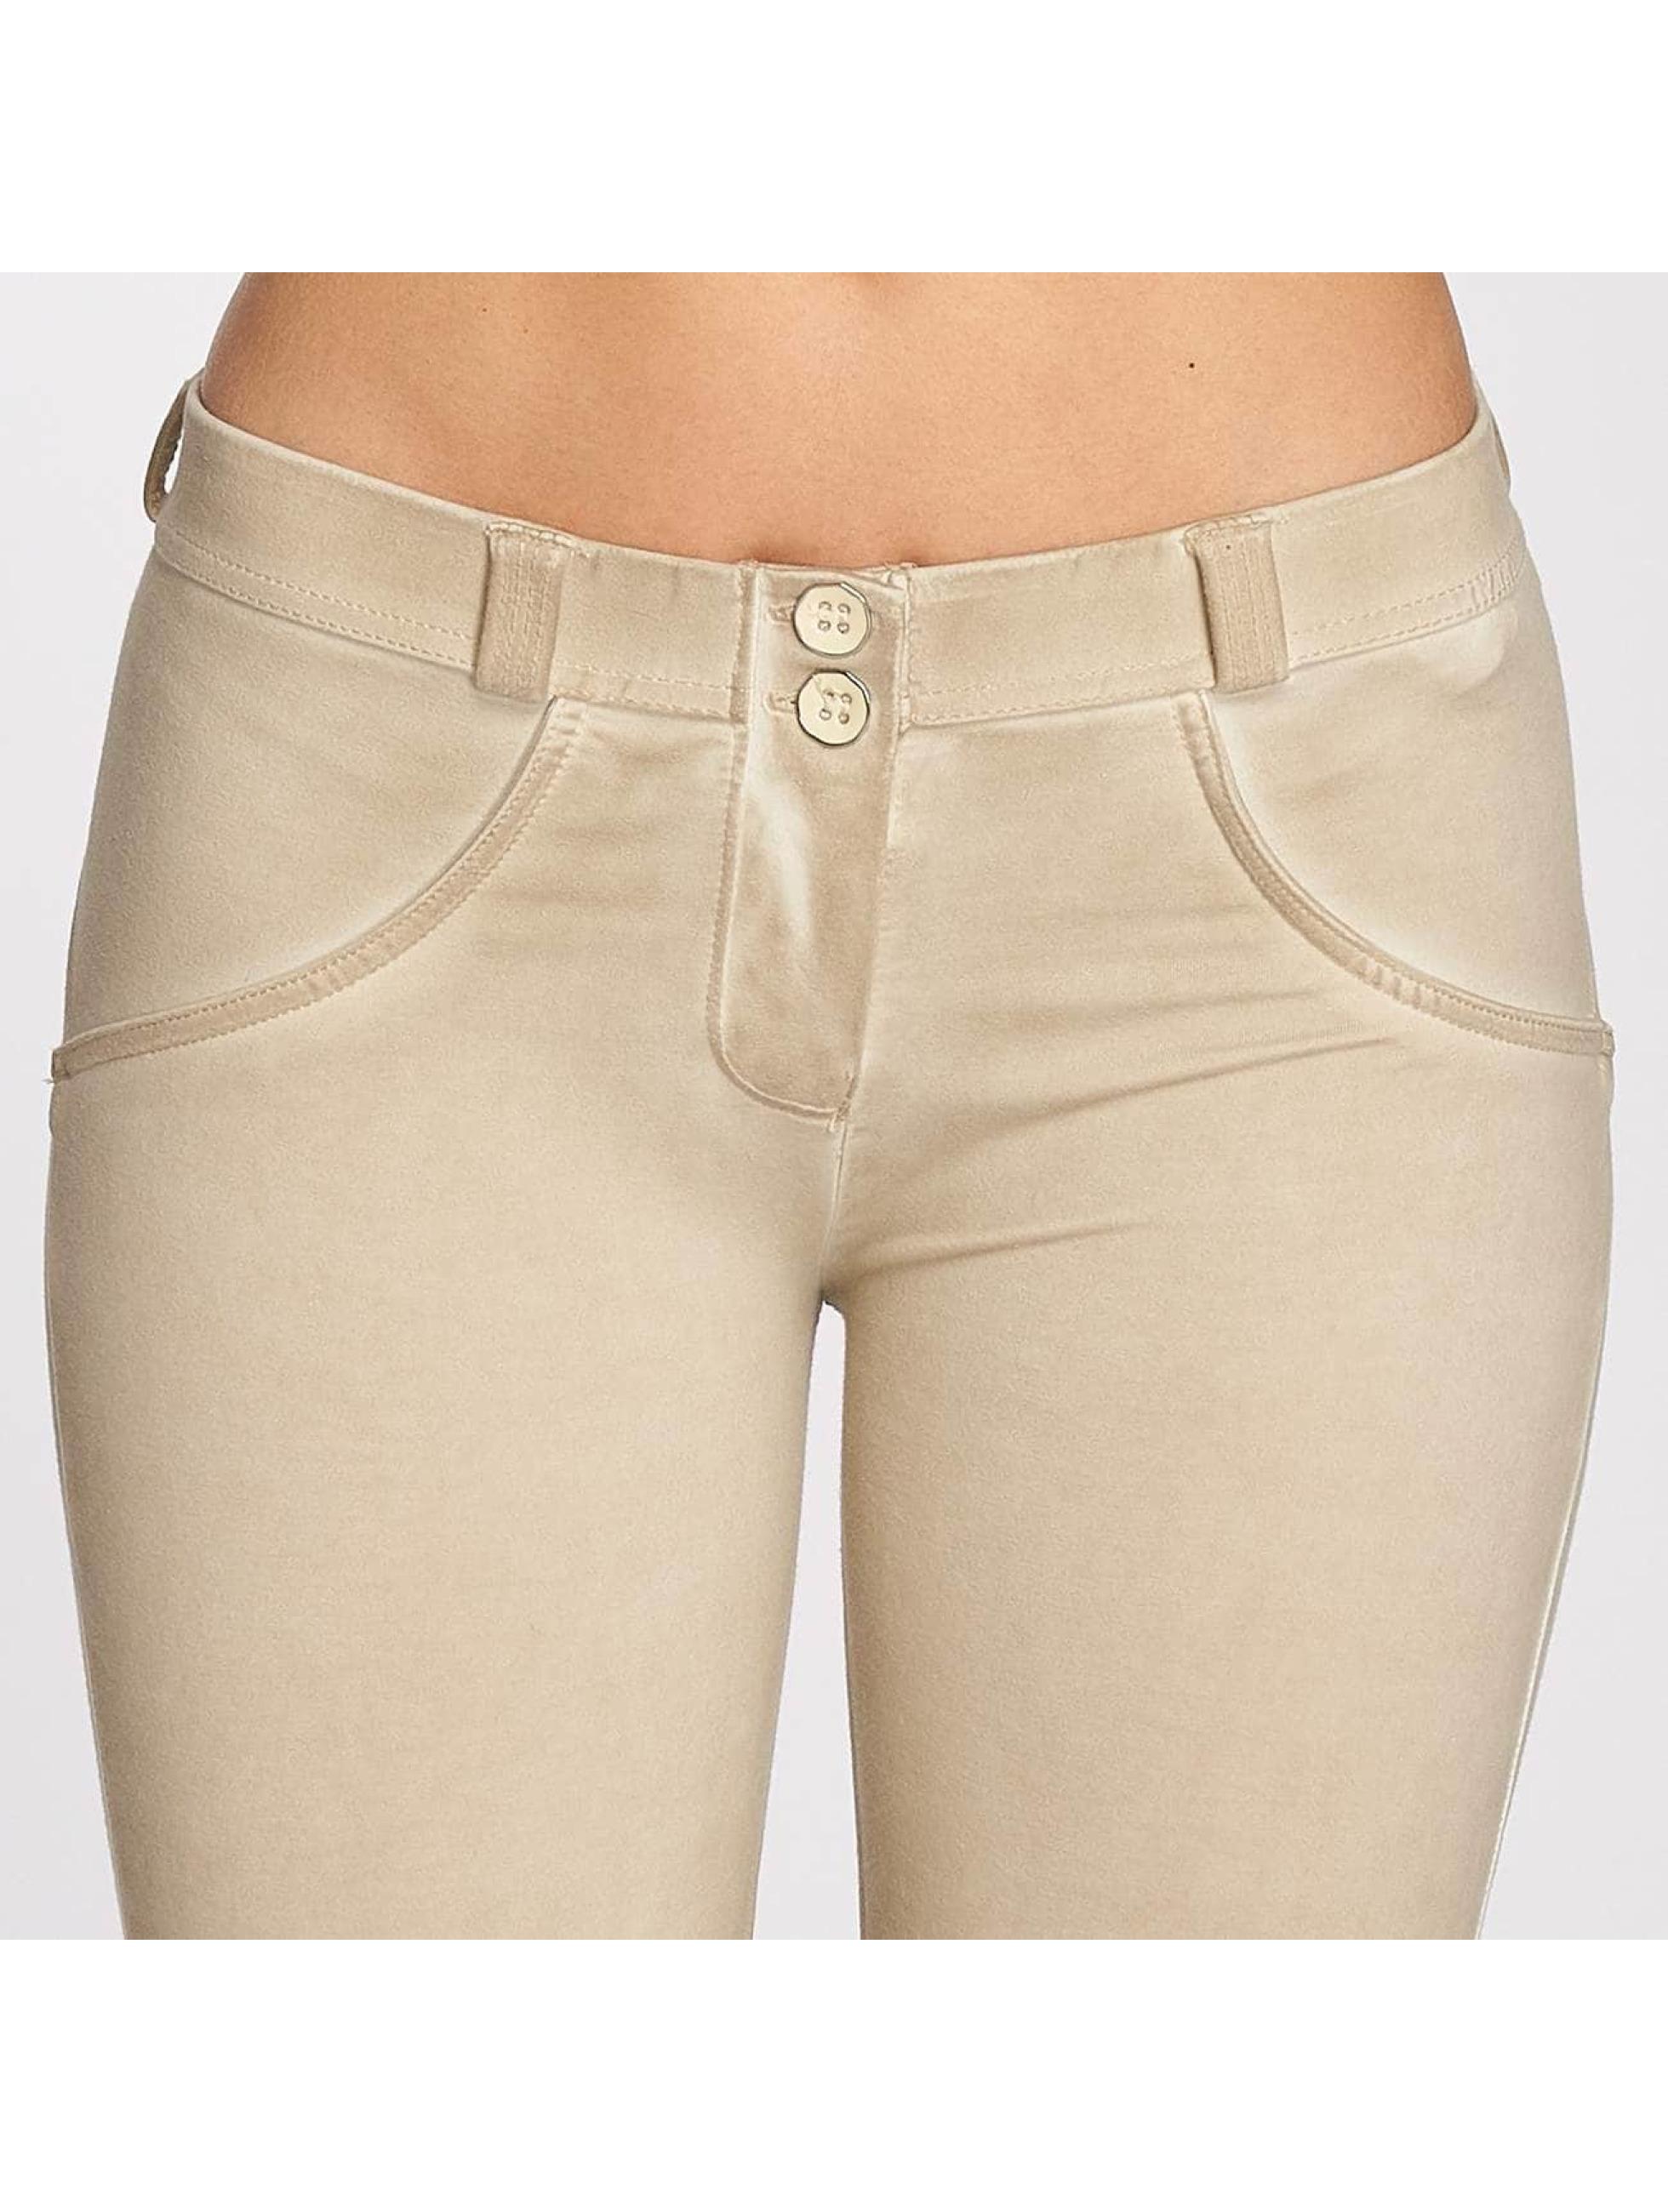 Freddy Tynne bukser Pantalone 7/8 beige